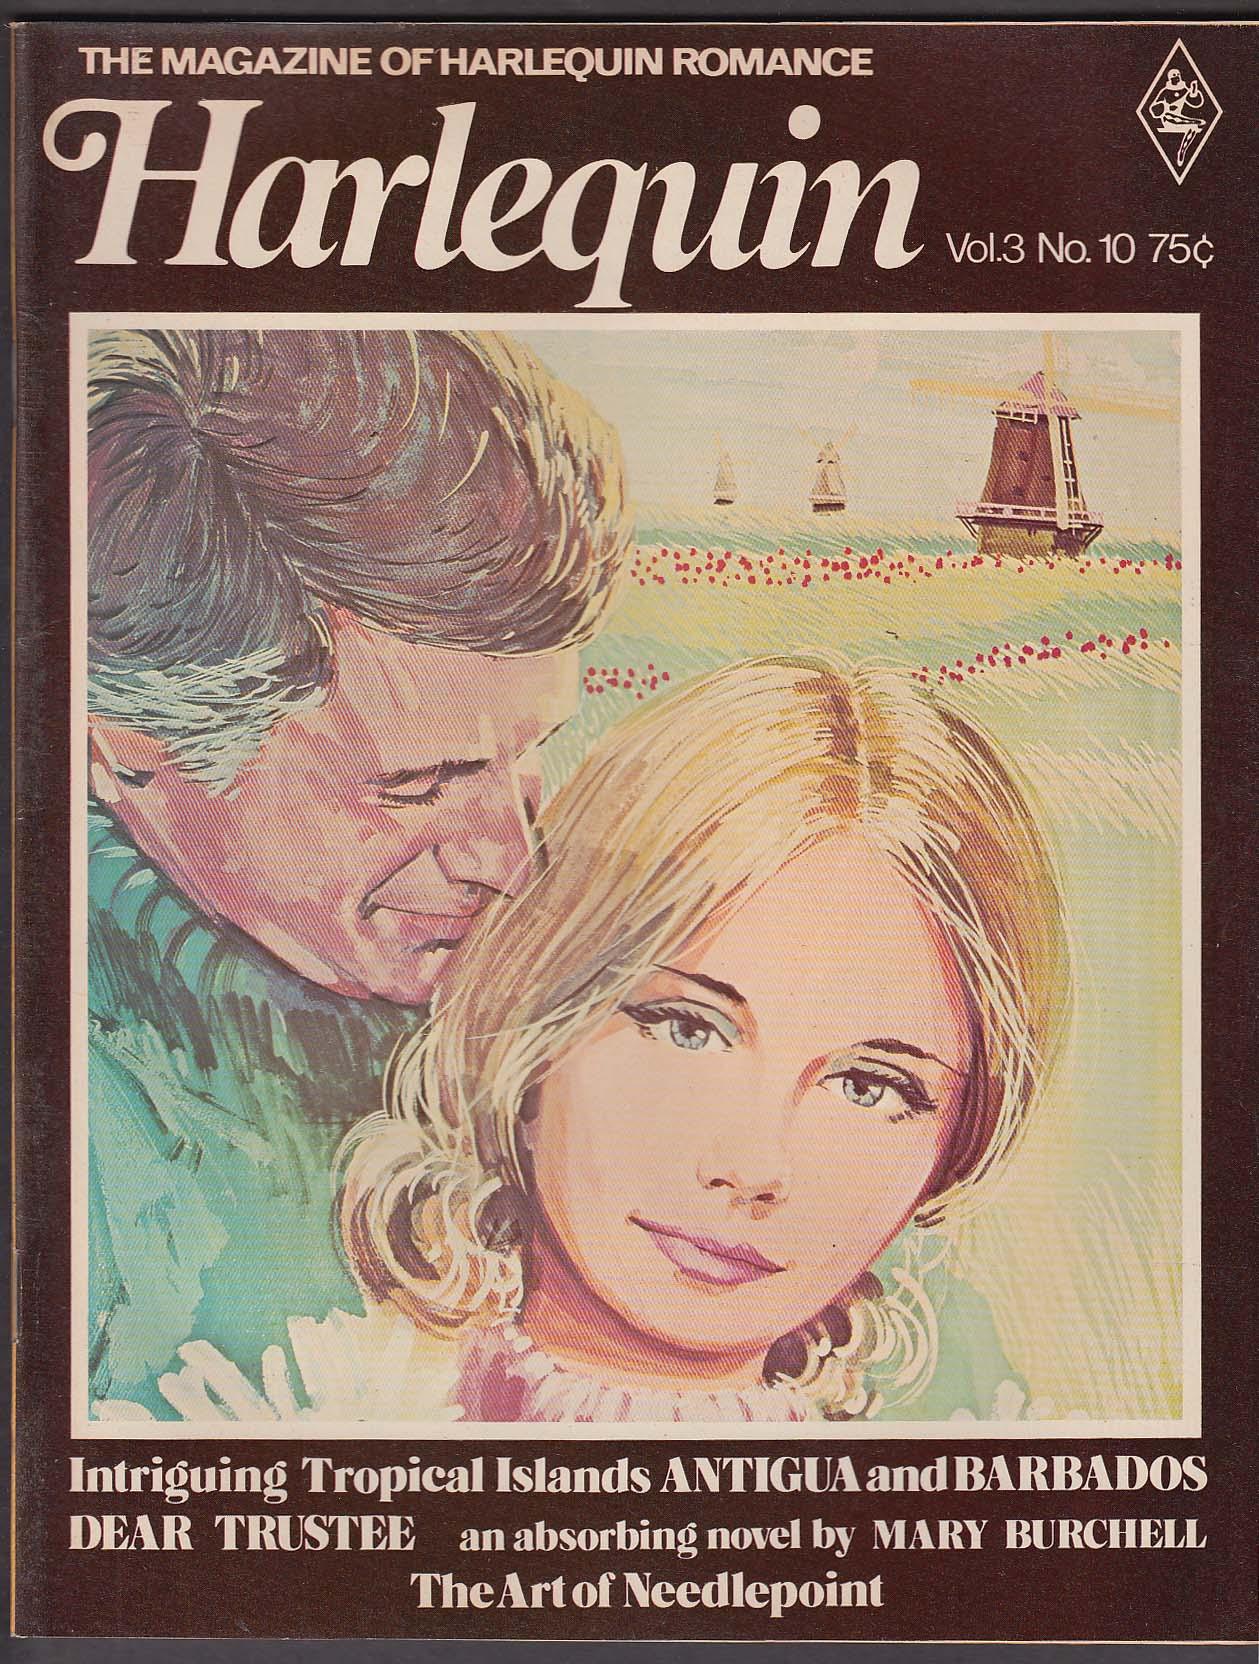 Image for HARLEQUIN V3 #10 Mary Burchell Margery Lewty Needlepoint Antigua Barbados + 1975